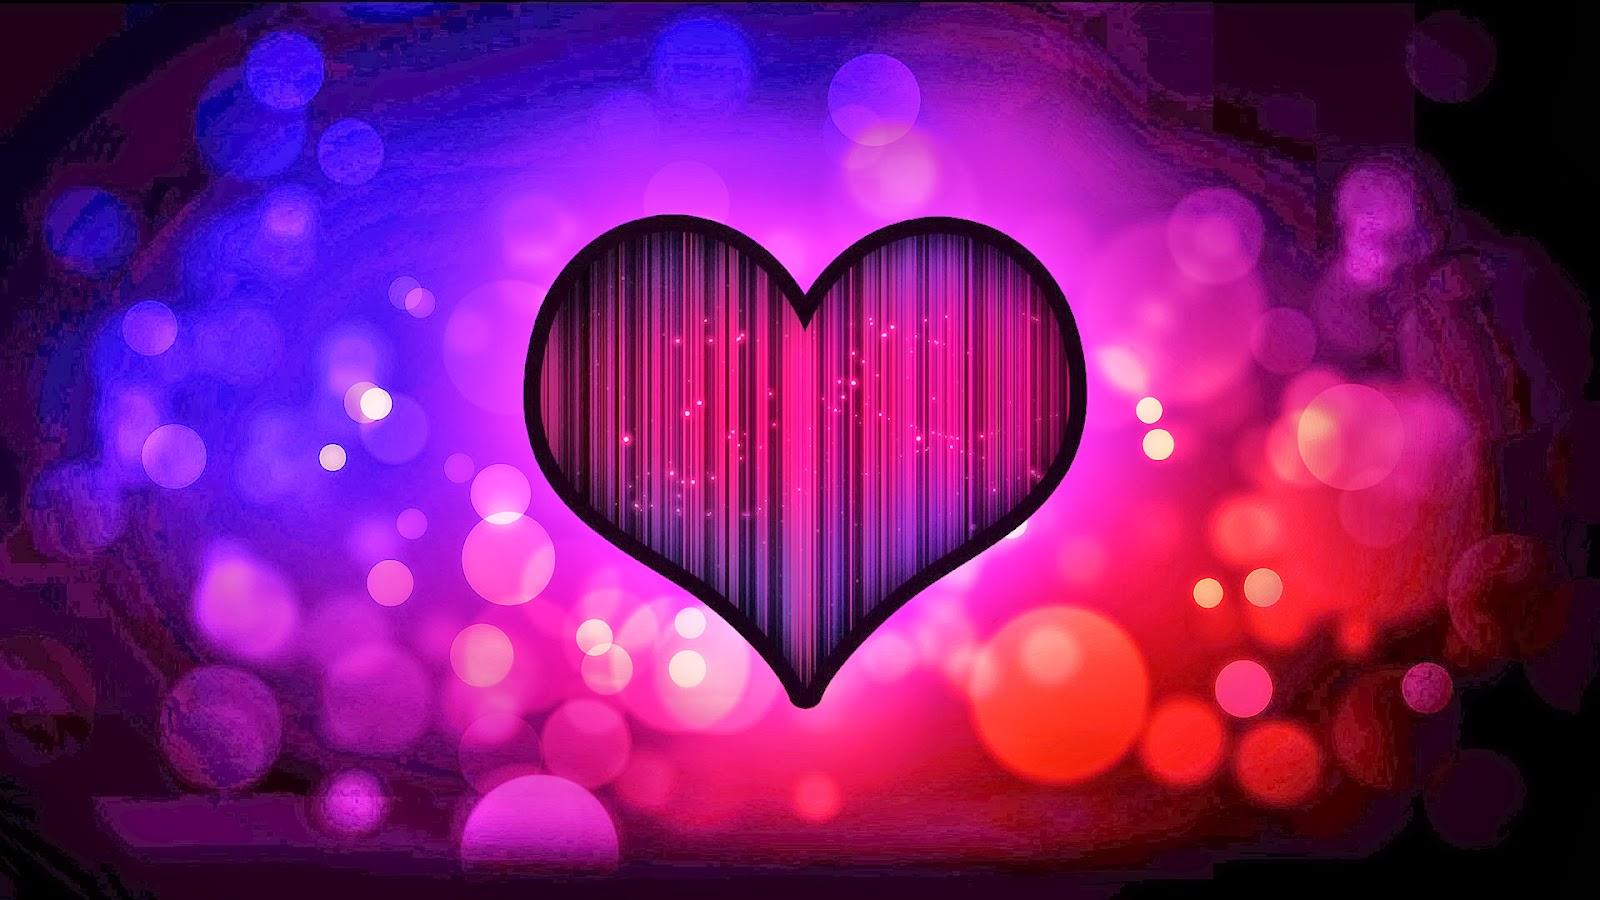 hot love heart desktop wallpaper gendiswallpapercom